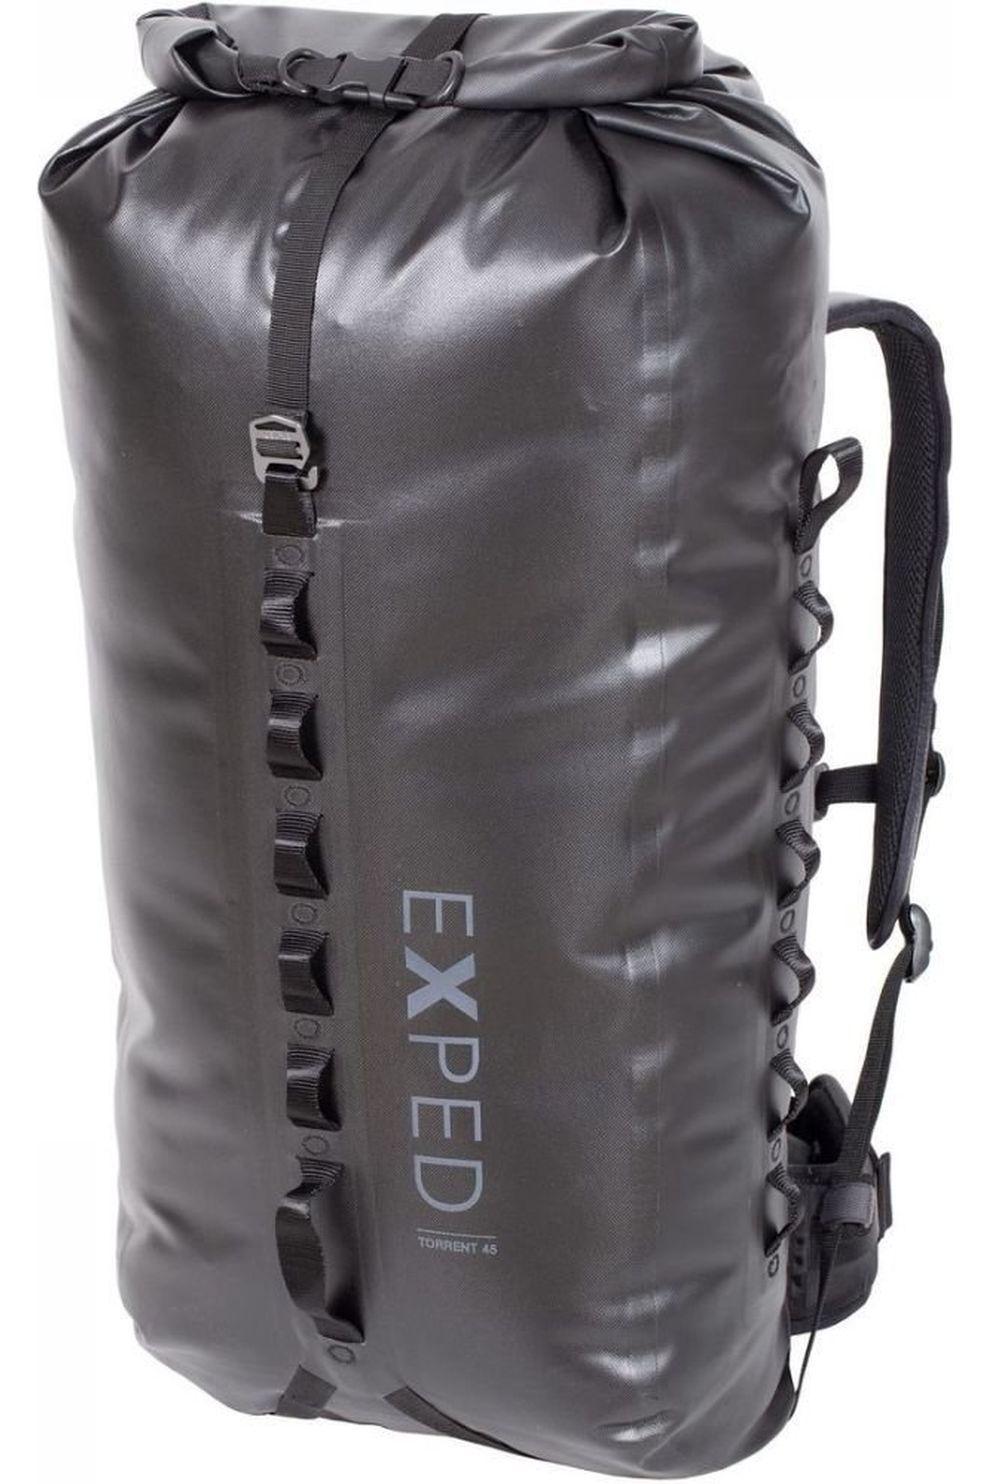 Exped Tourpack Torrent 45 - Zwart